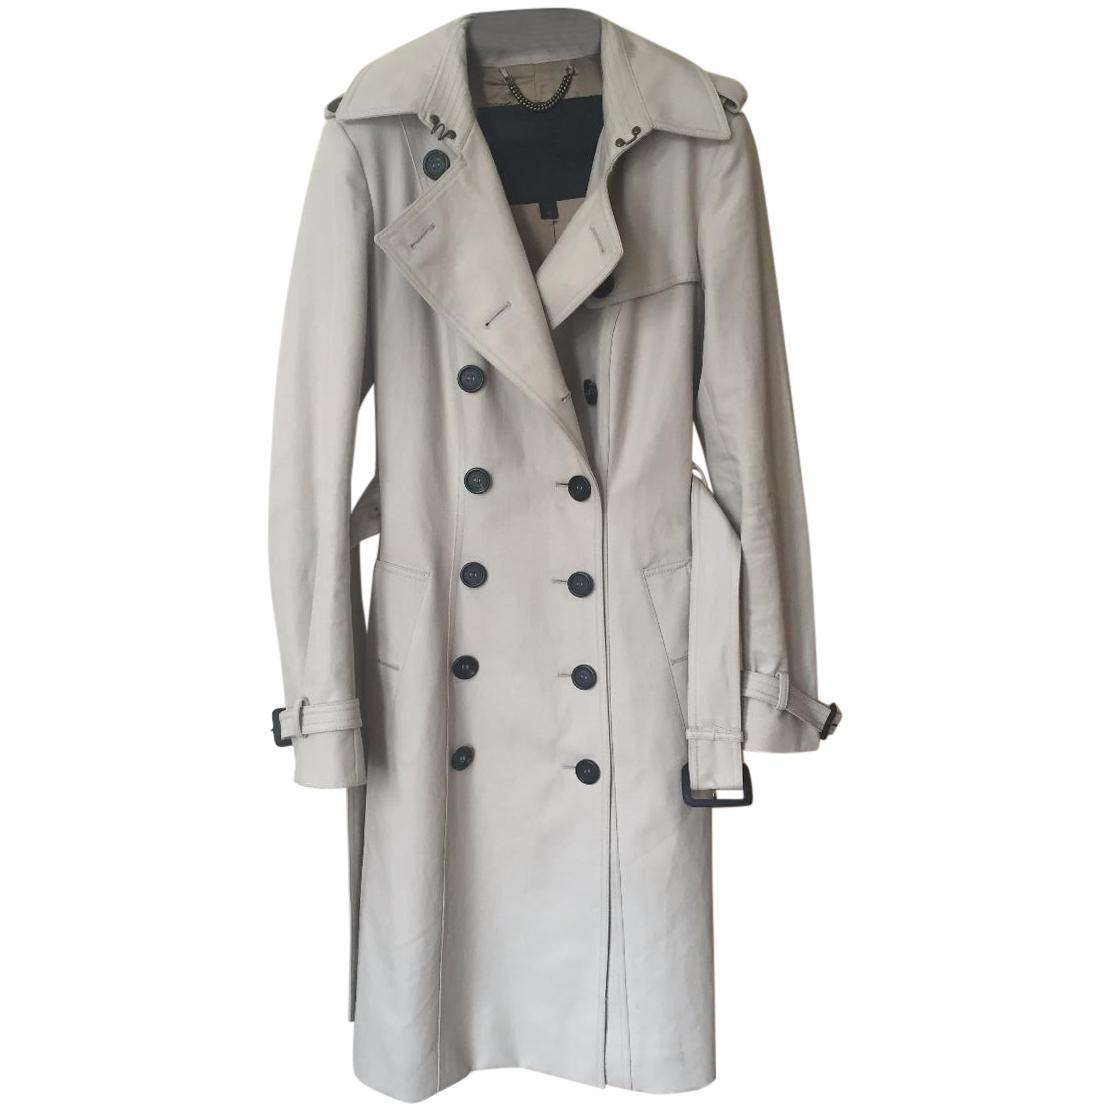 Burberry Prorsum Long Trench Coat